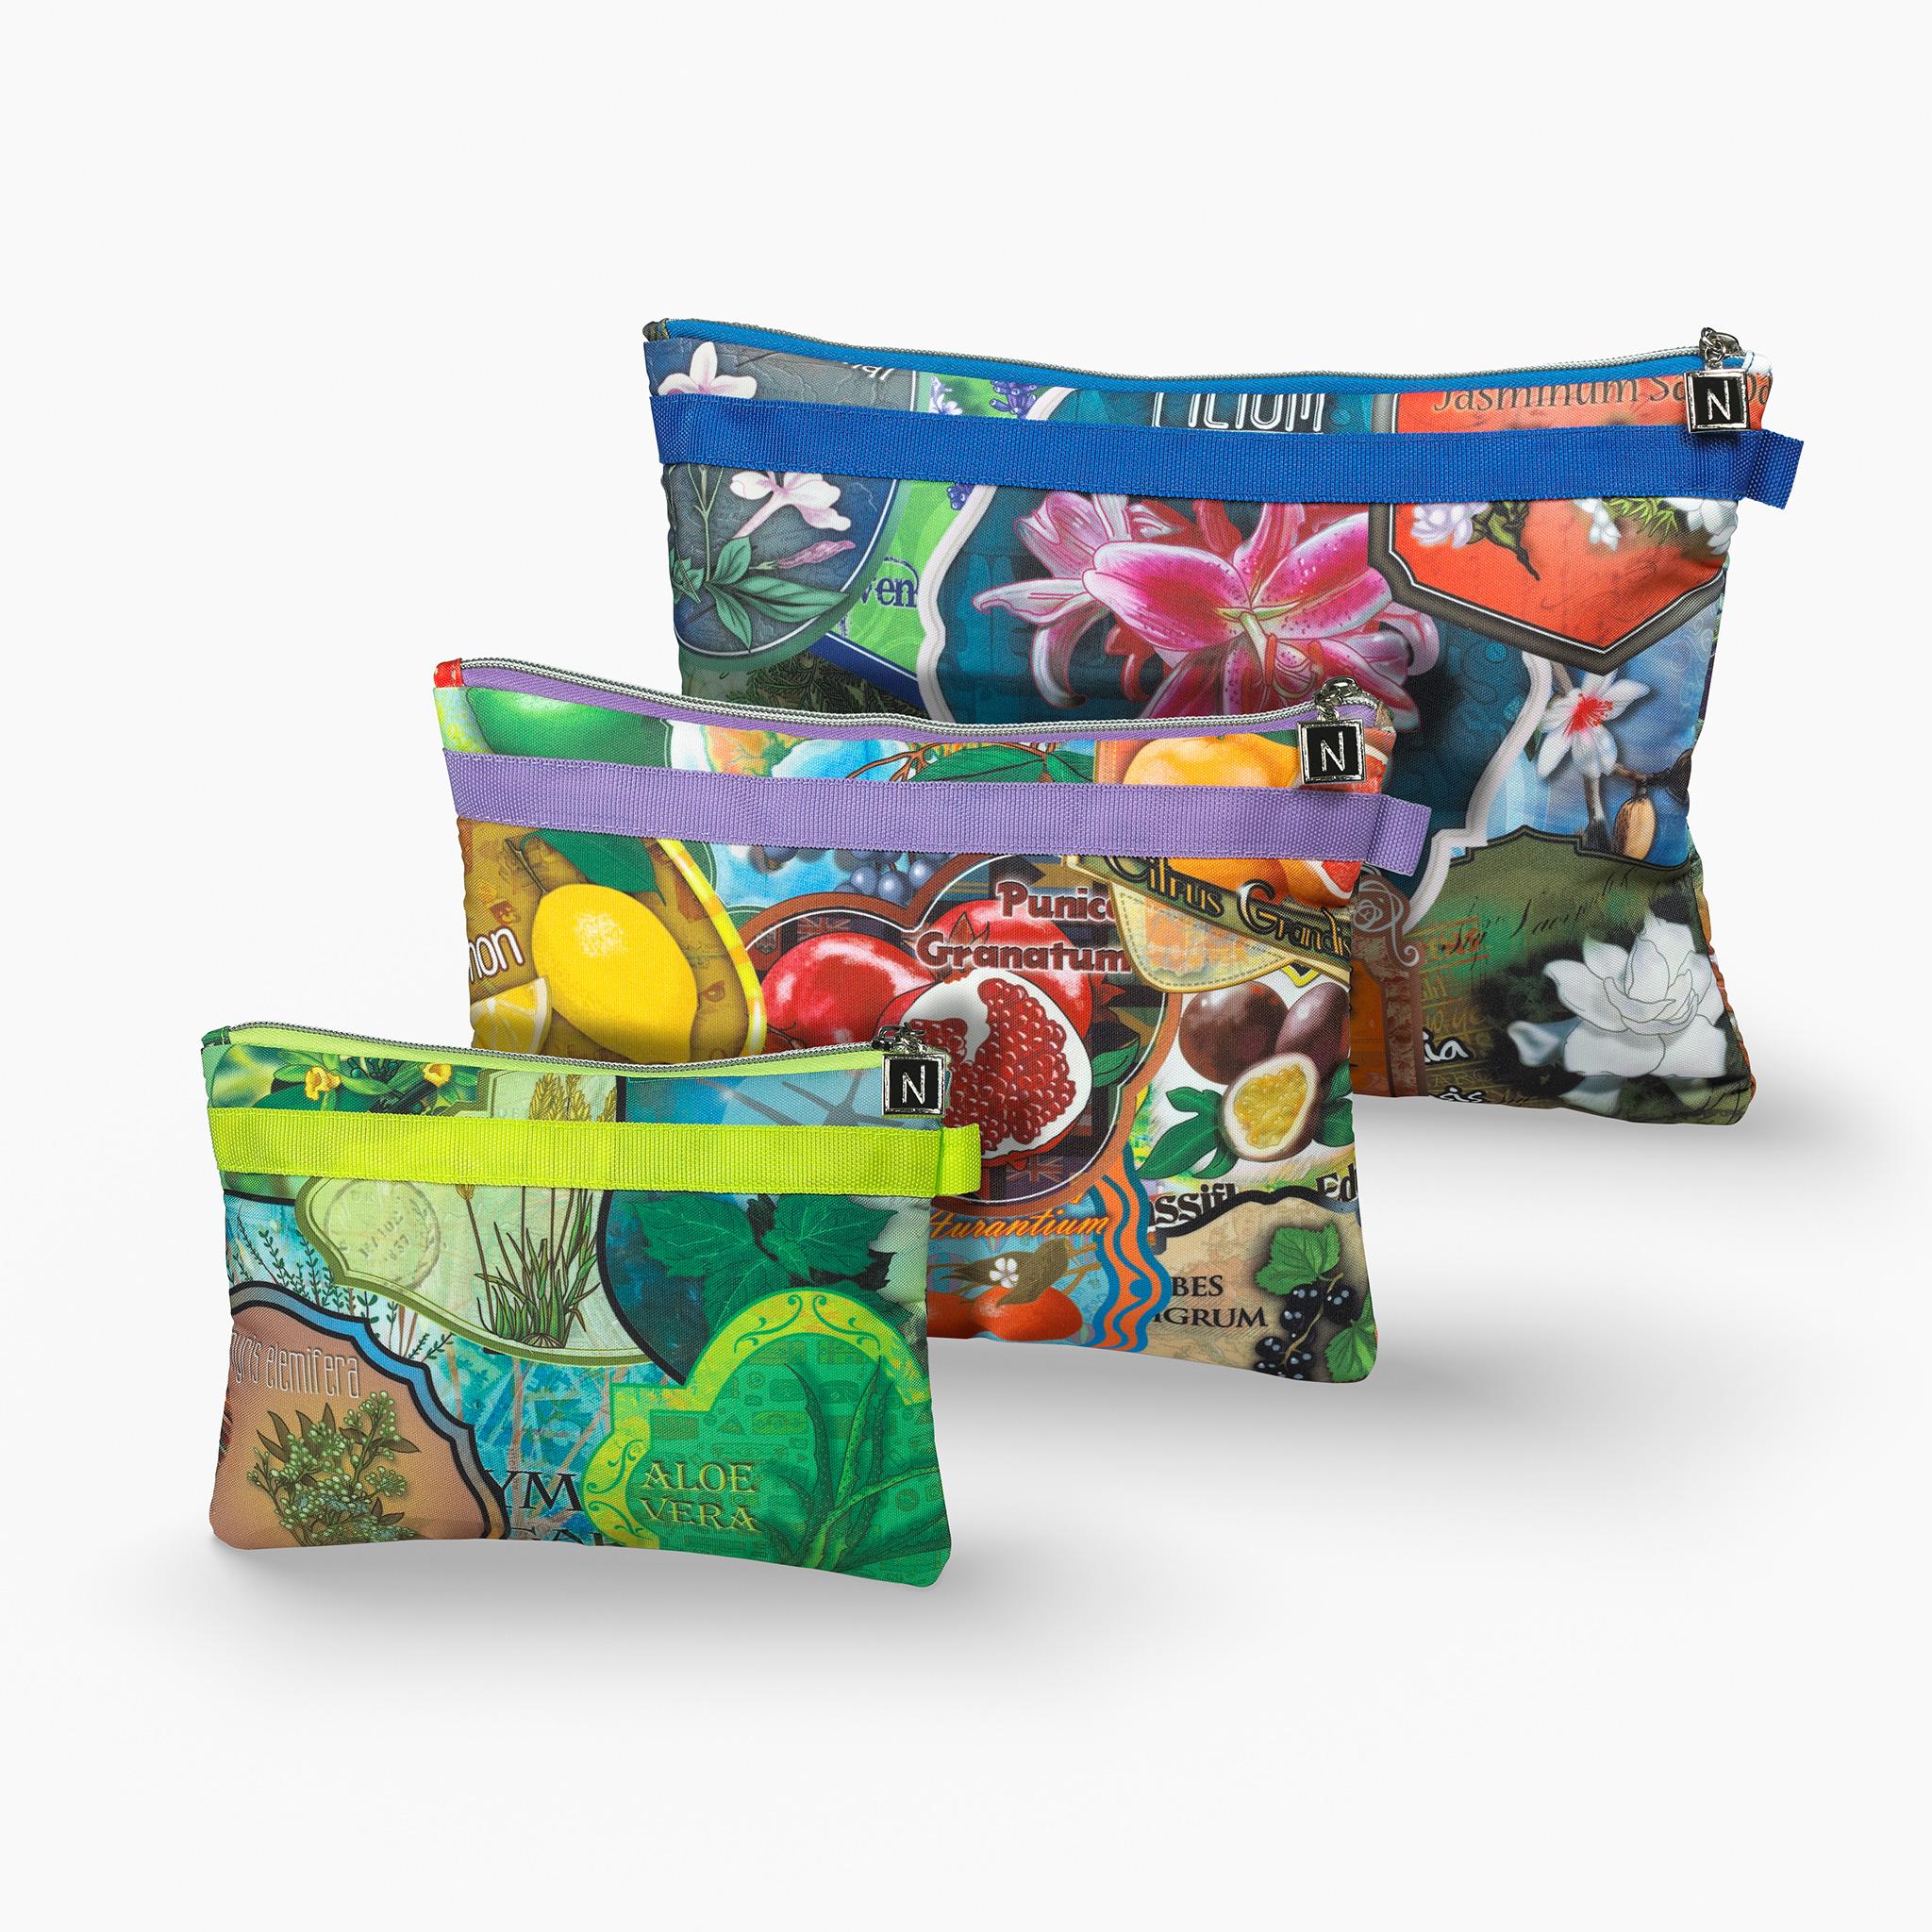 3 Designs of Nabila K's Travel Bag in 3 Different Designs